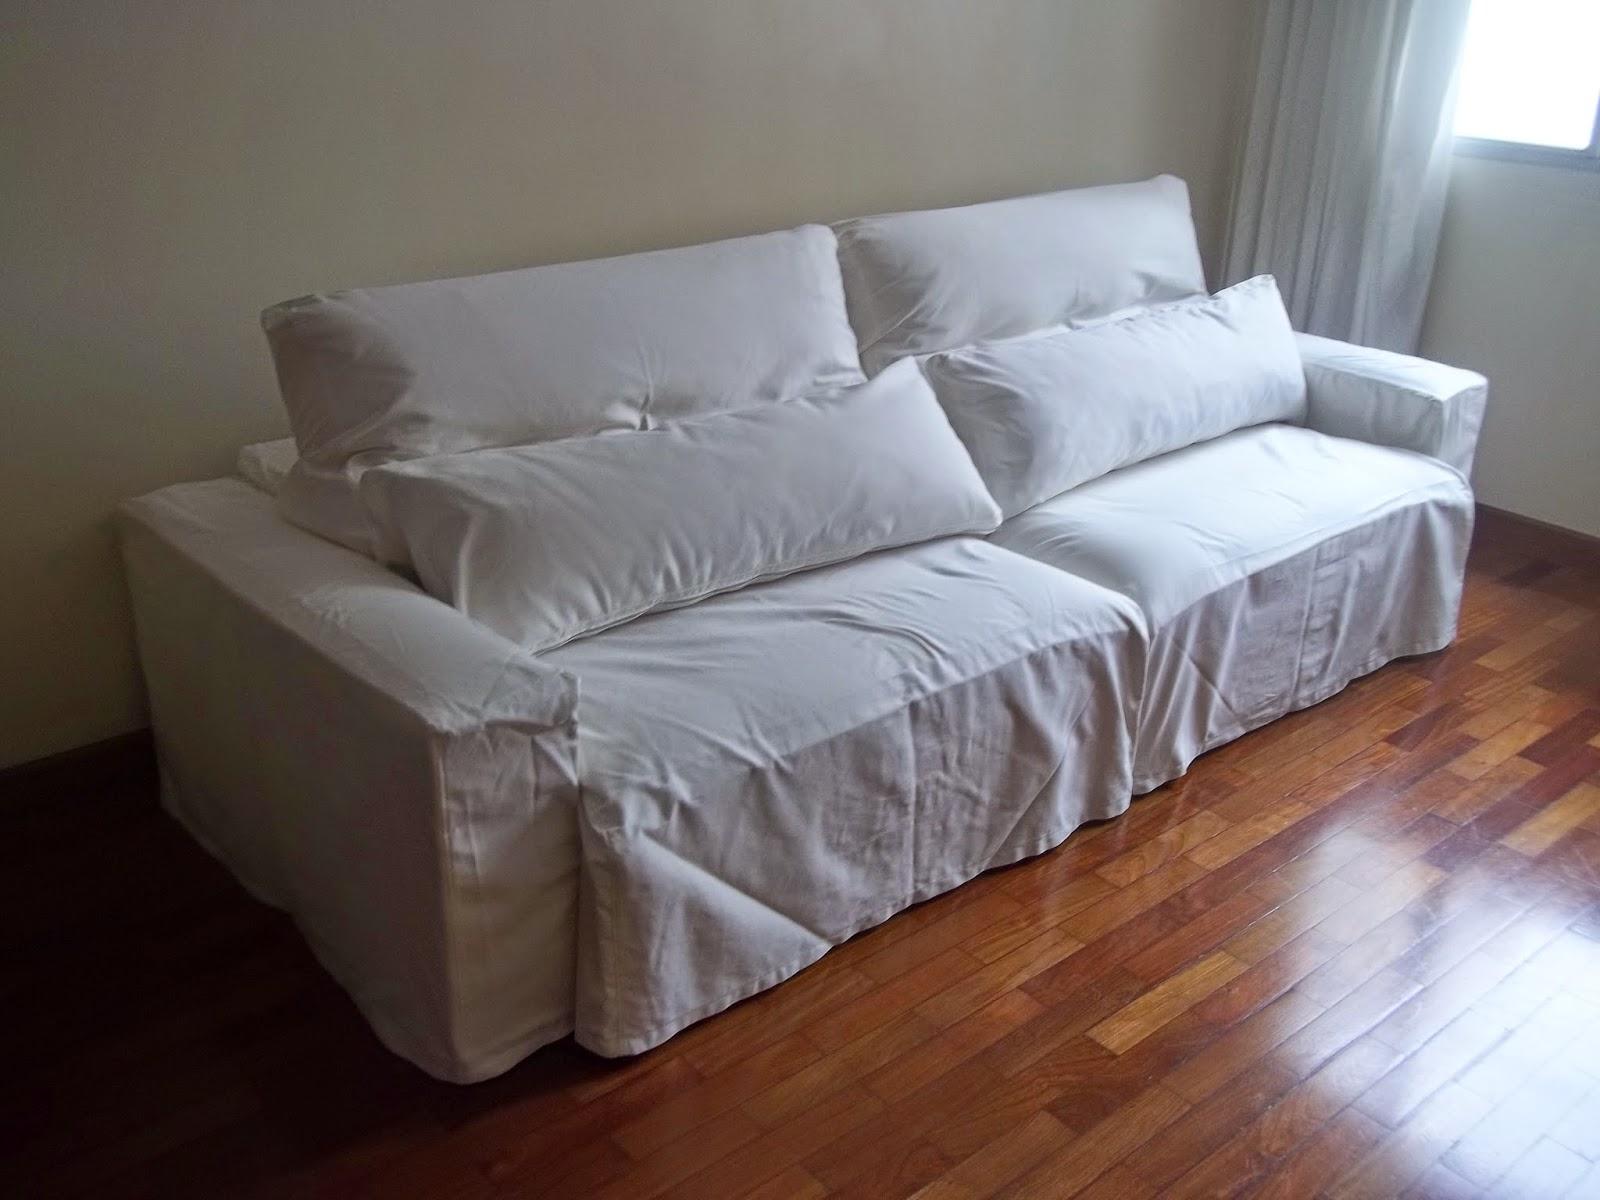 Dld decora es capa sob medida para sof - Sofas pequenos medidas ...